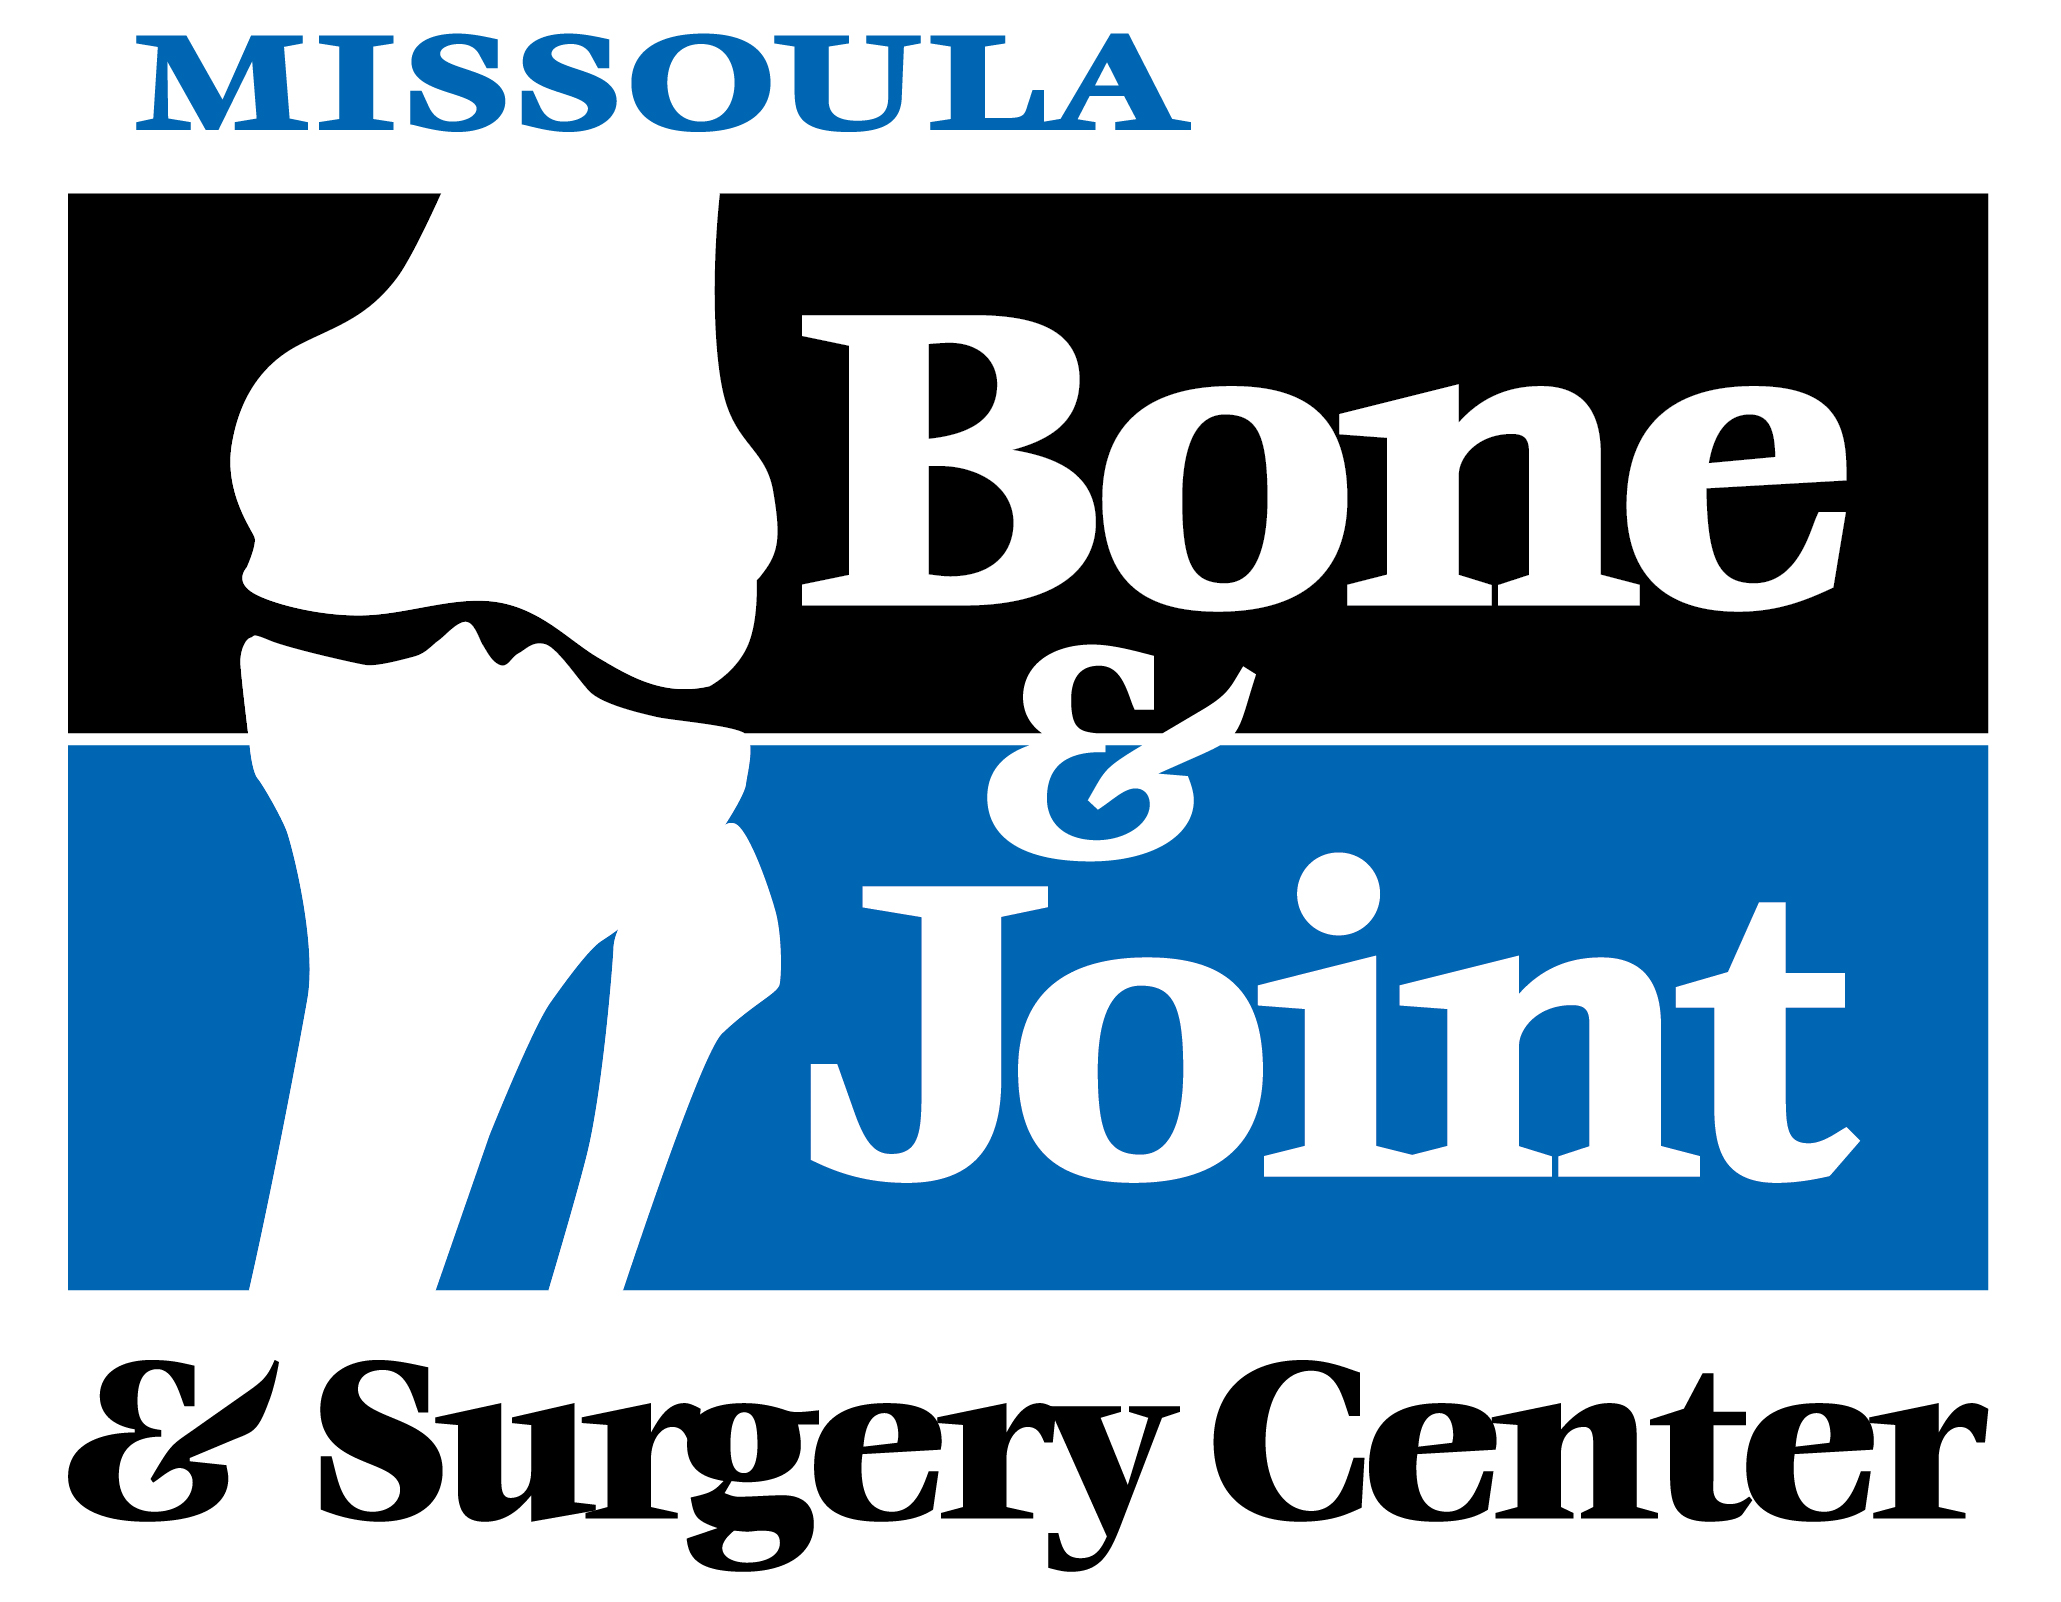 Missoula Bone & Joint and Surgery Center logo